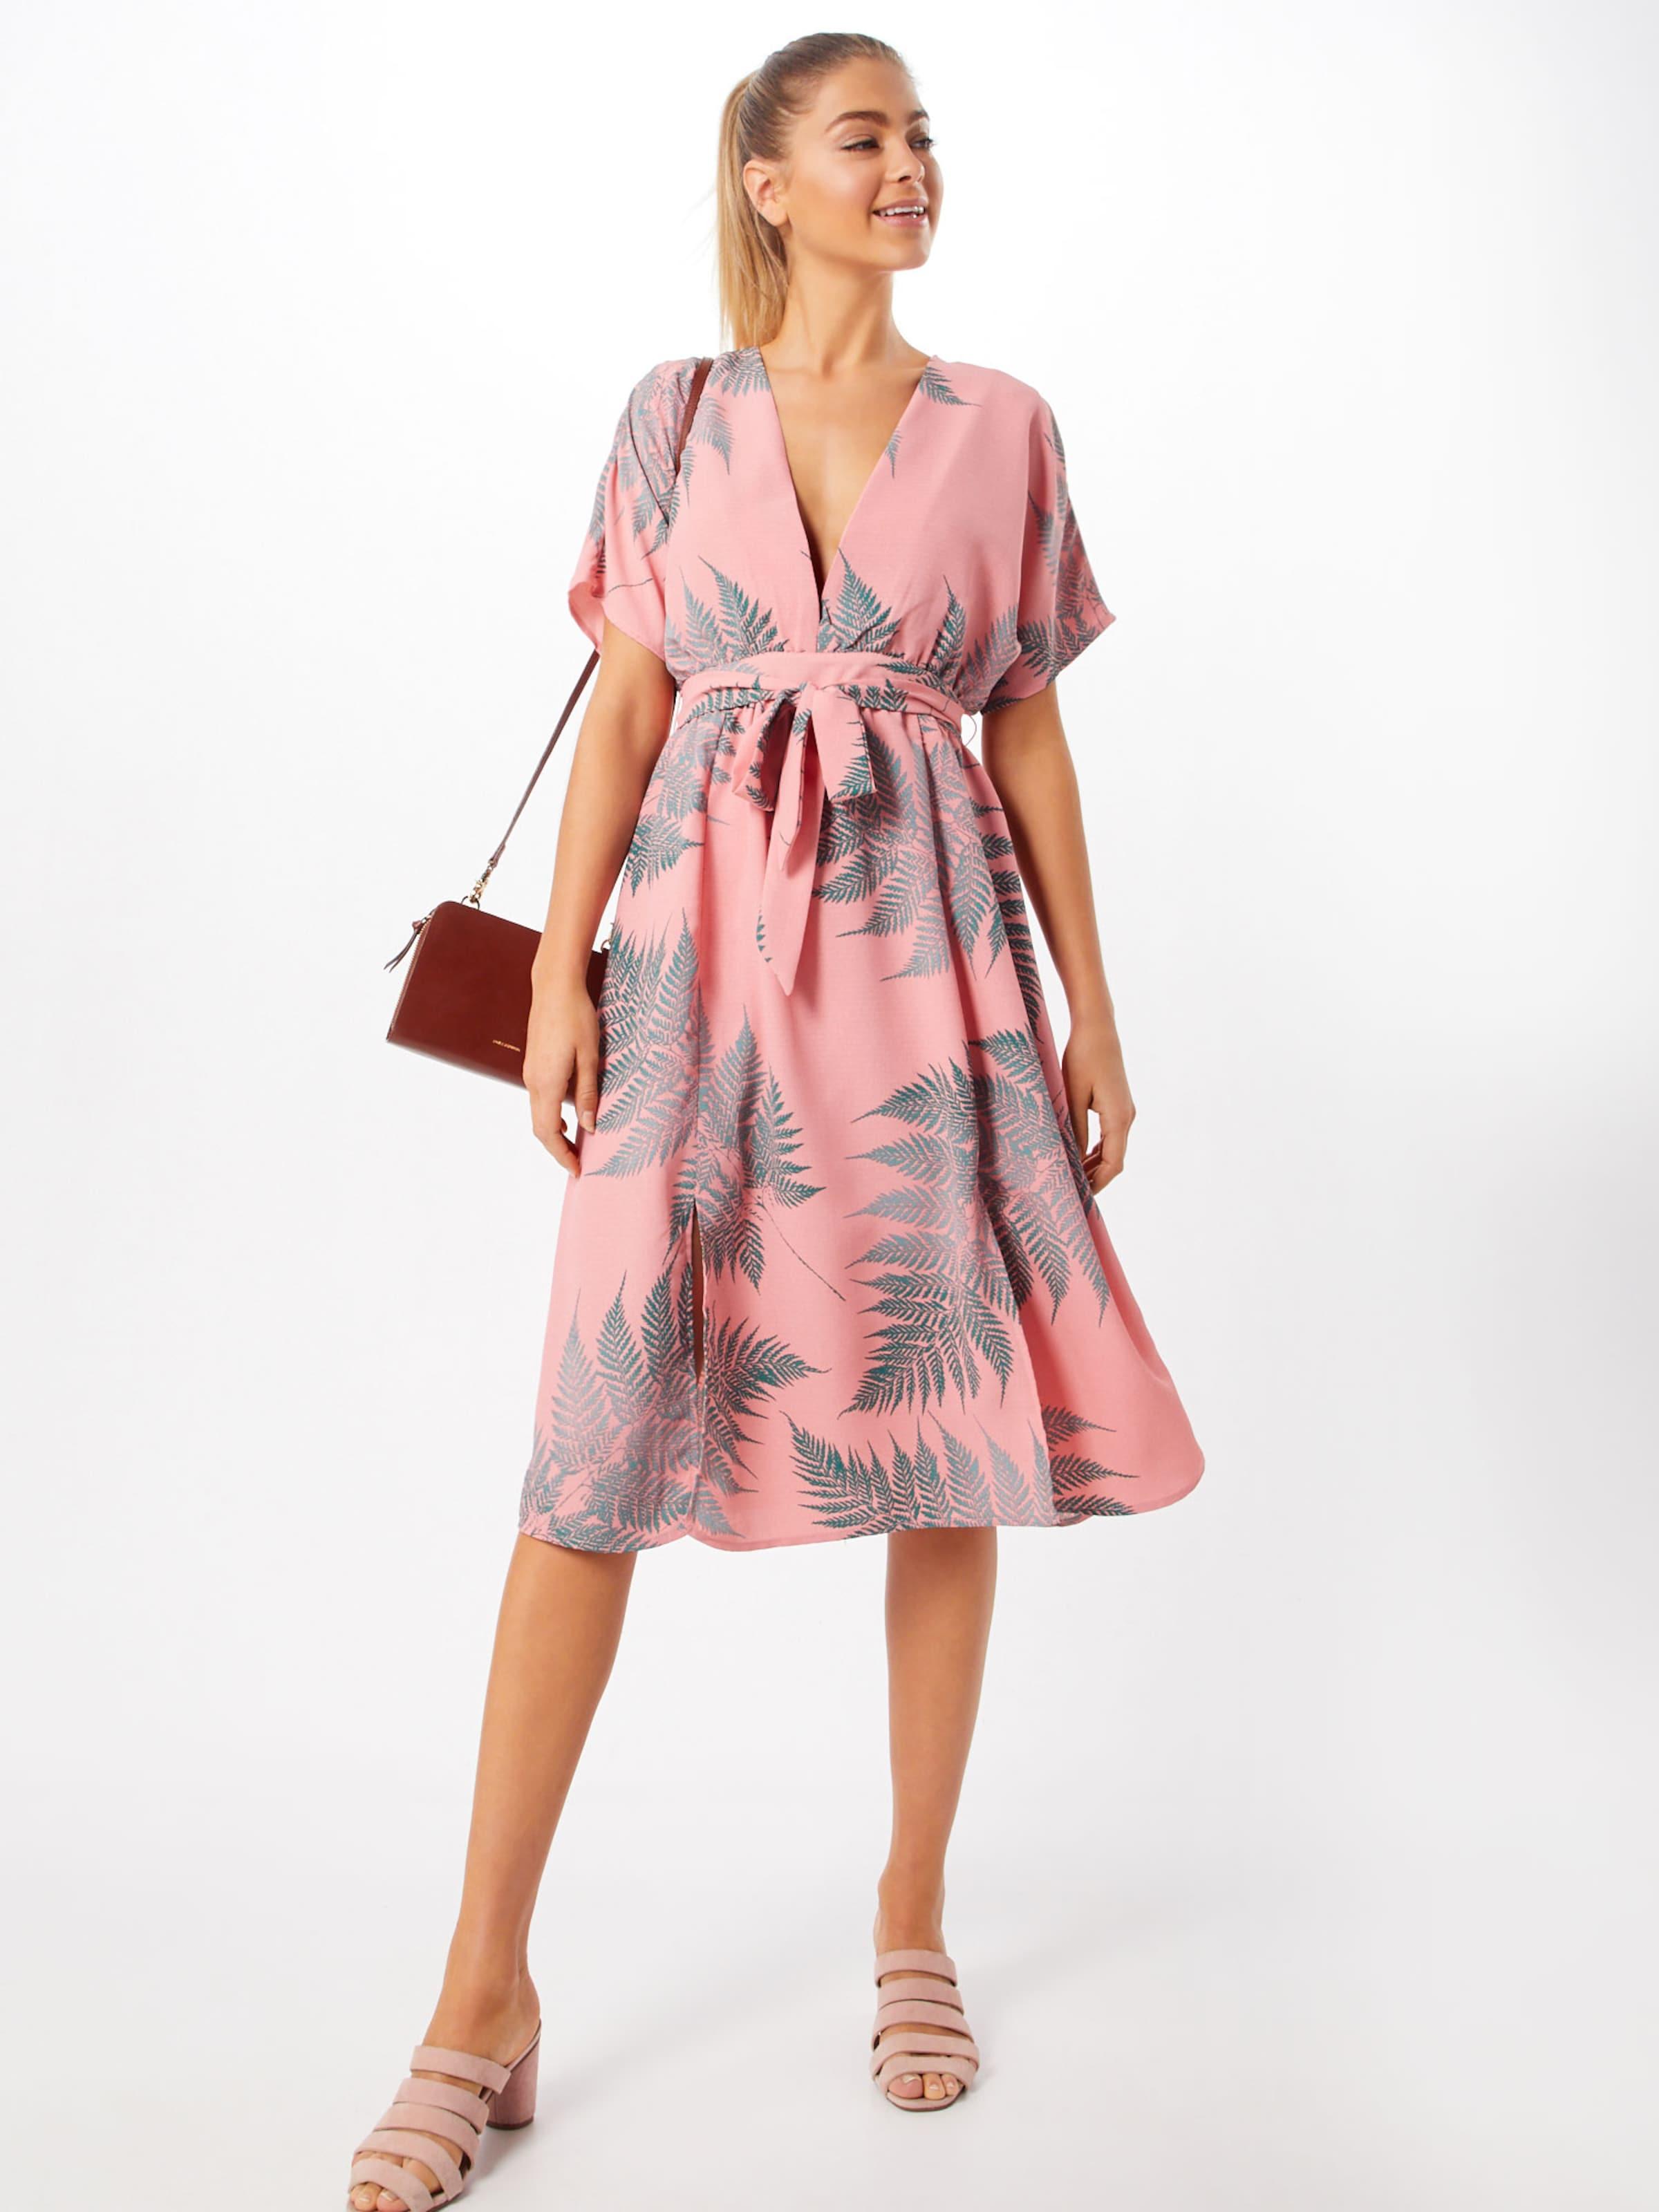 Glamorous Glamorous In GrauPink Kleid Kleid 'ck5396' rhQdts